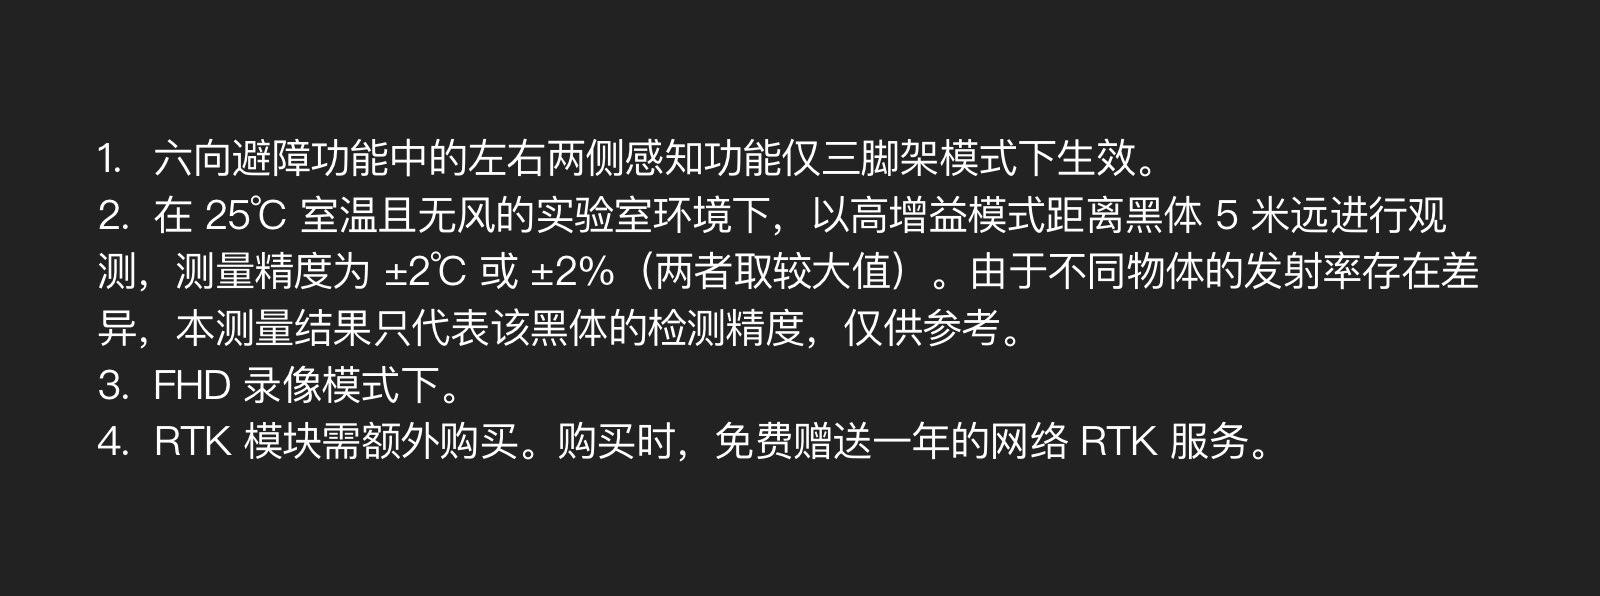 M2EA_PC%20_cn_14.jpg